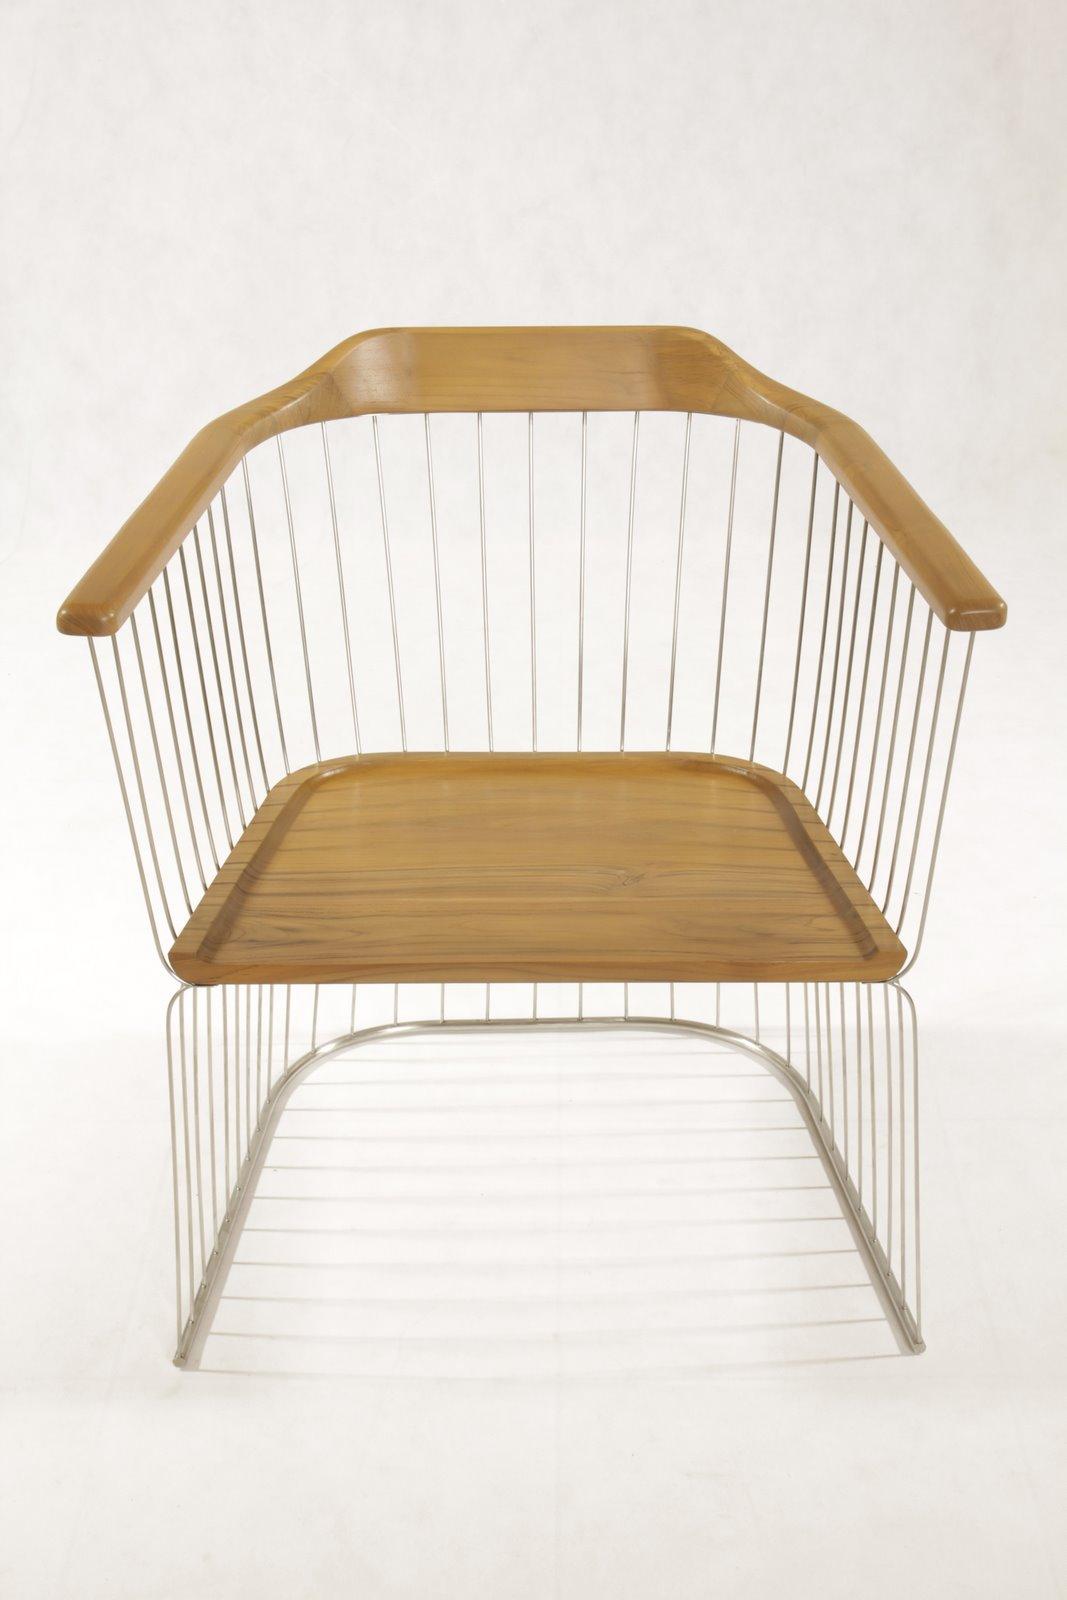 011210 interval chair_02.jpg